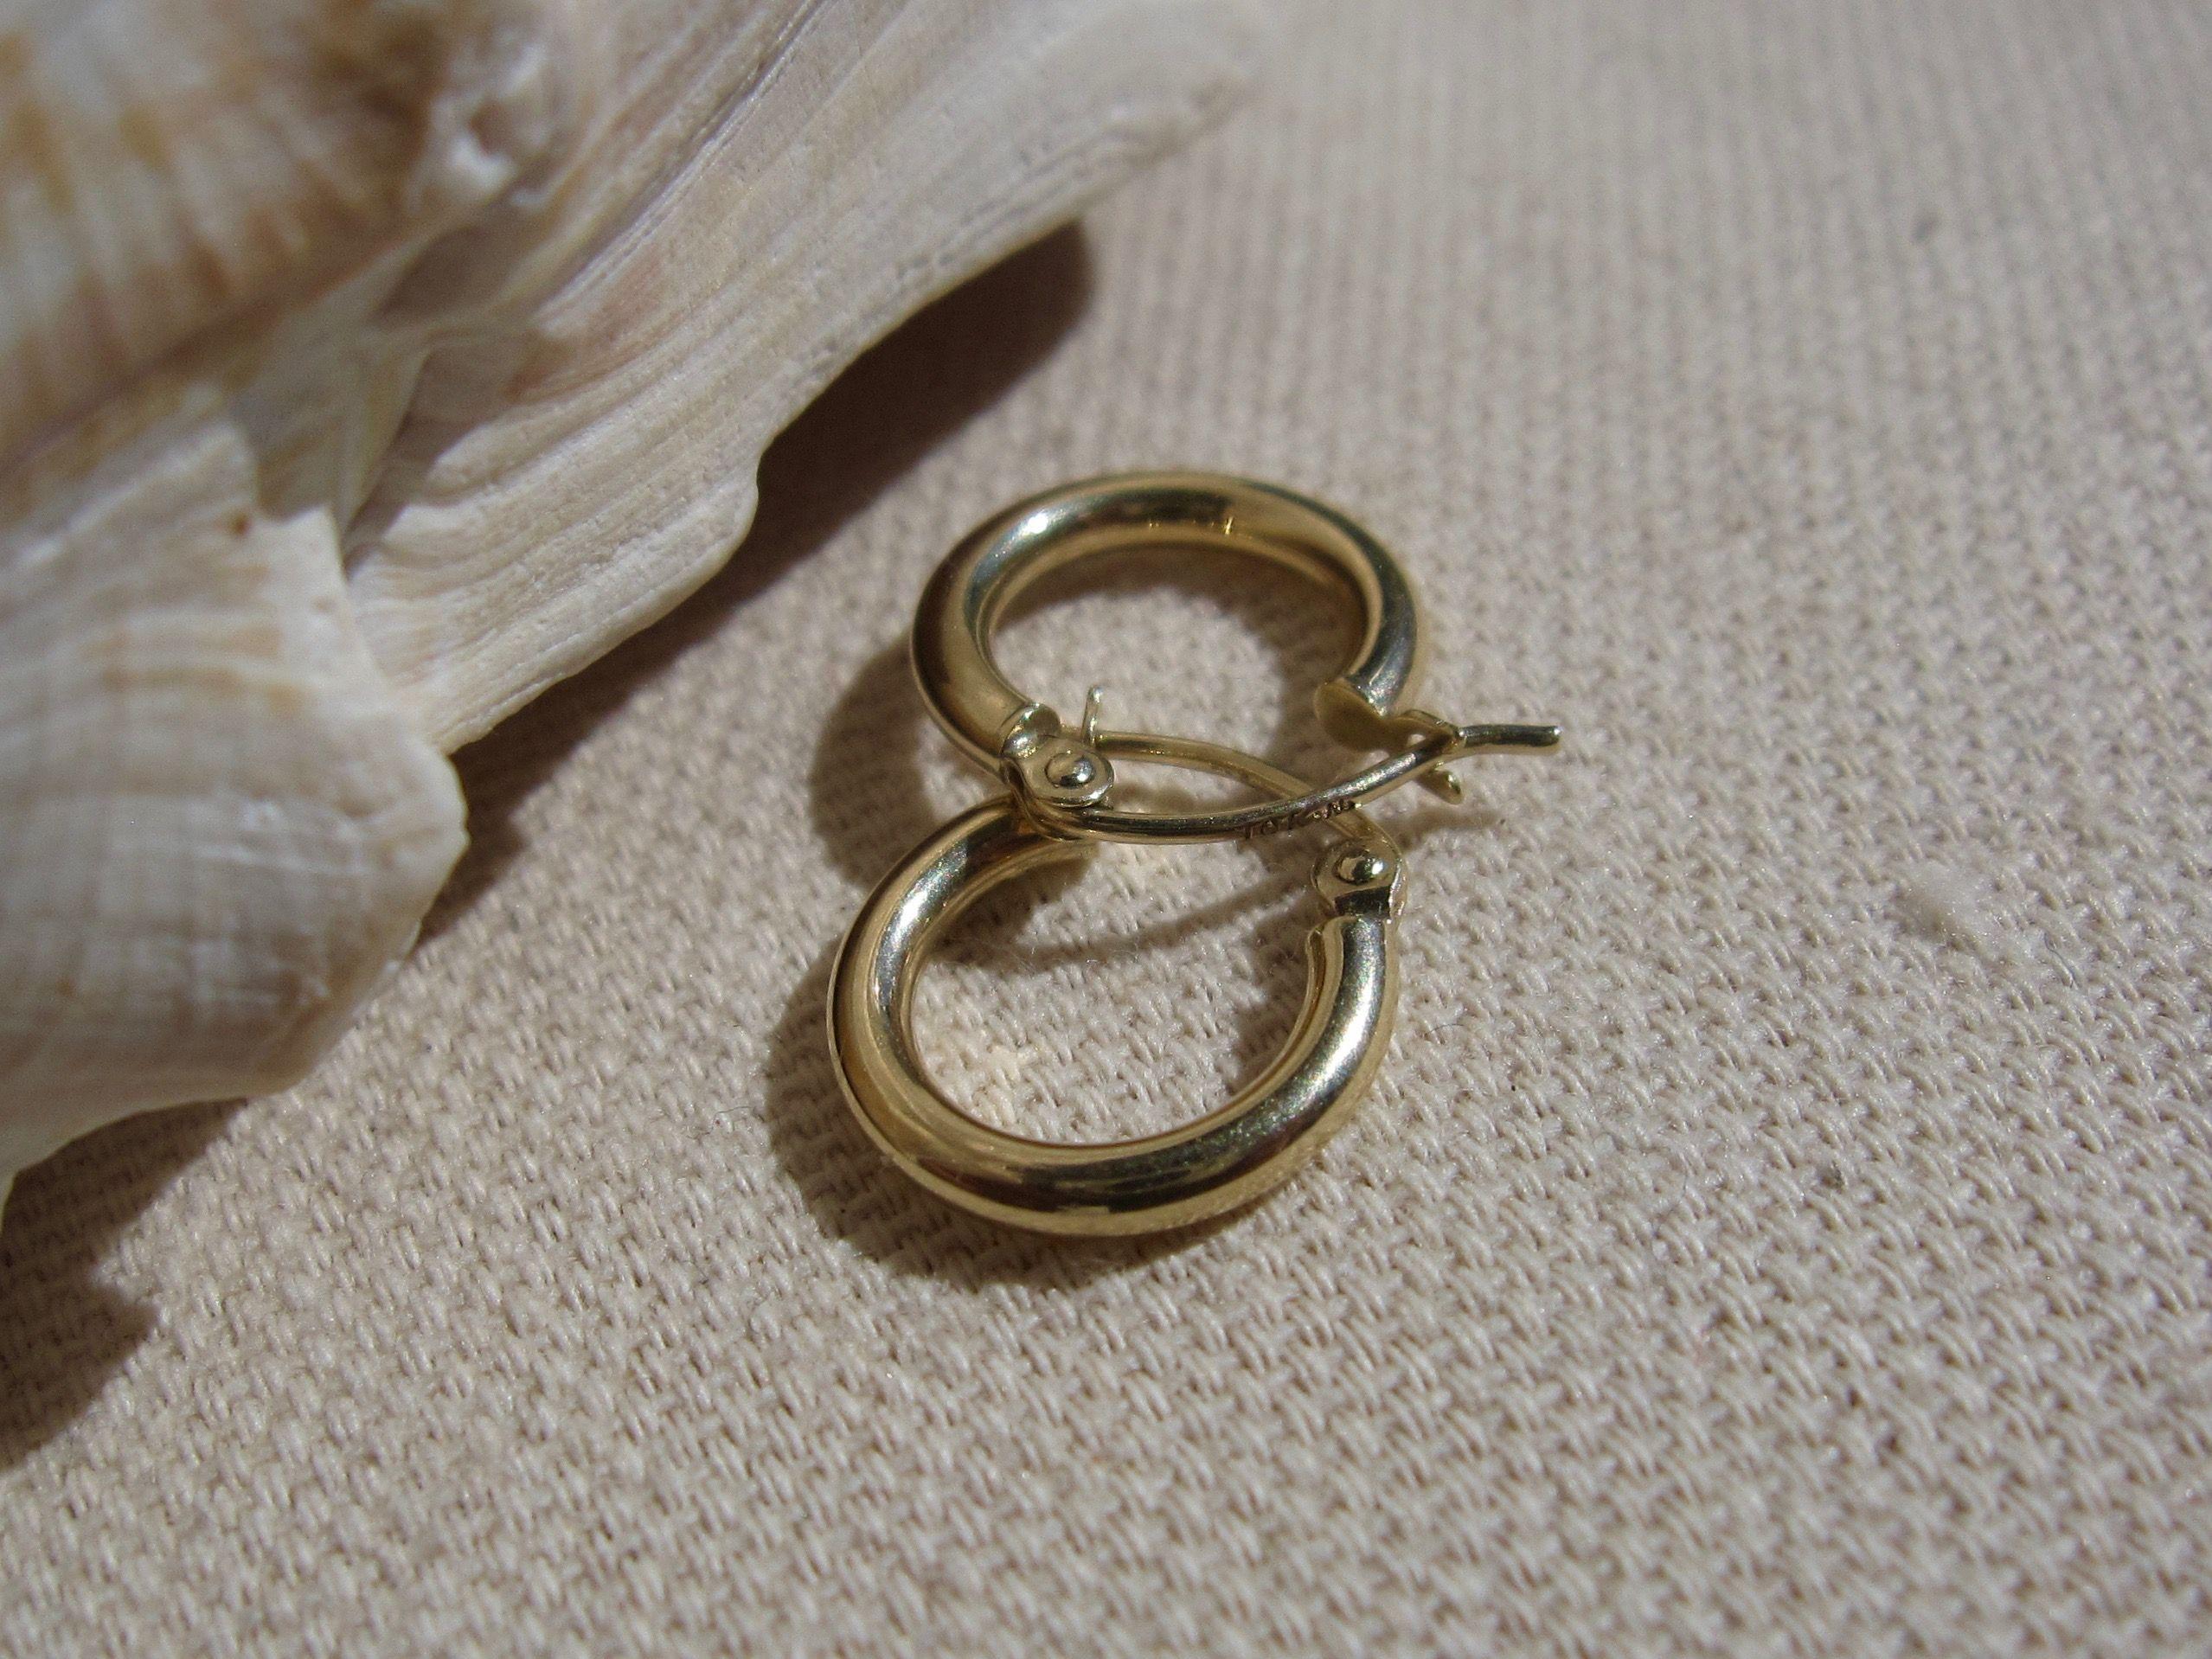 Medelln Earrings 10K Gold Hoops 10K Gold Earrings Gold Earrings